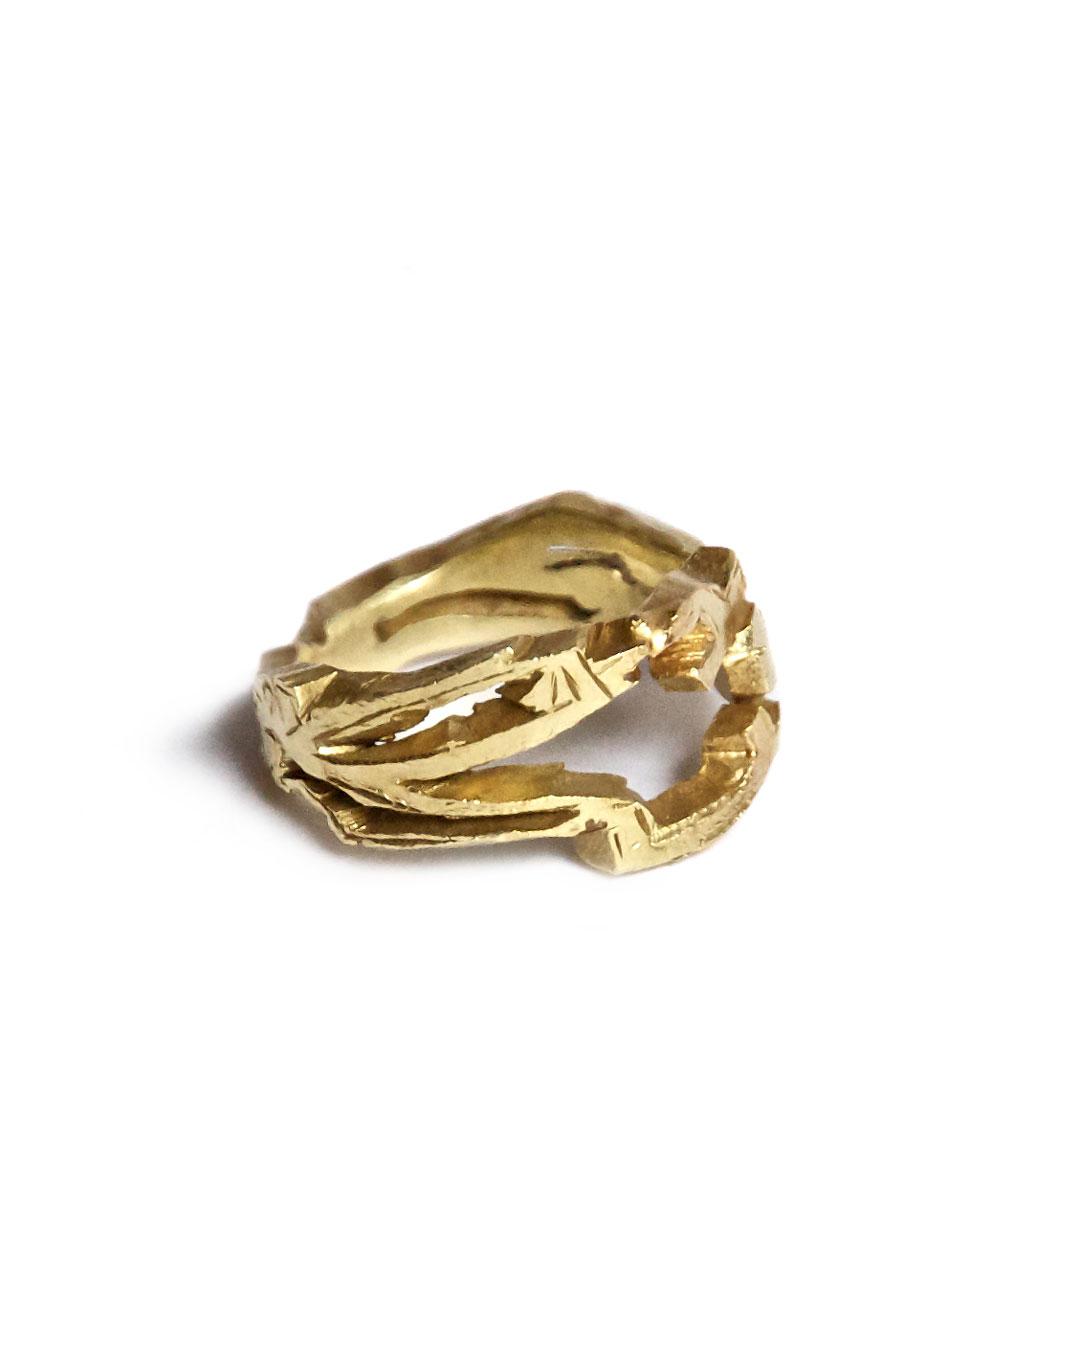 Rudolf Kocéa, Lücke (Hole), 2007, ring; 14ct gold, 23 x 22 x 7 mm, €1940